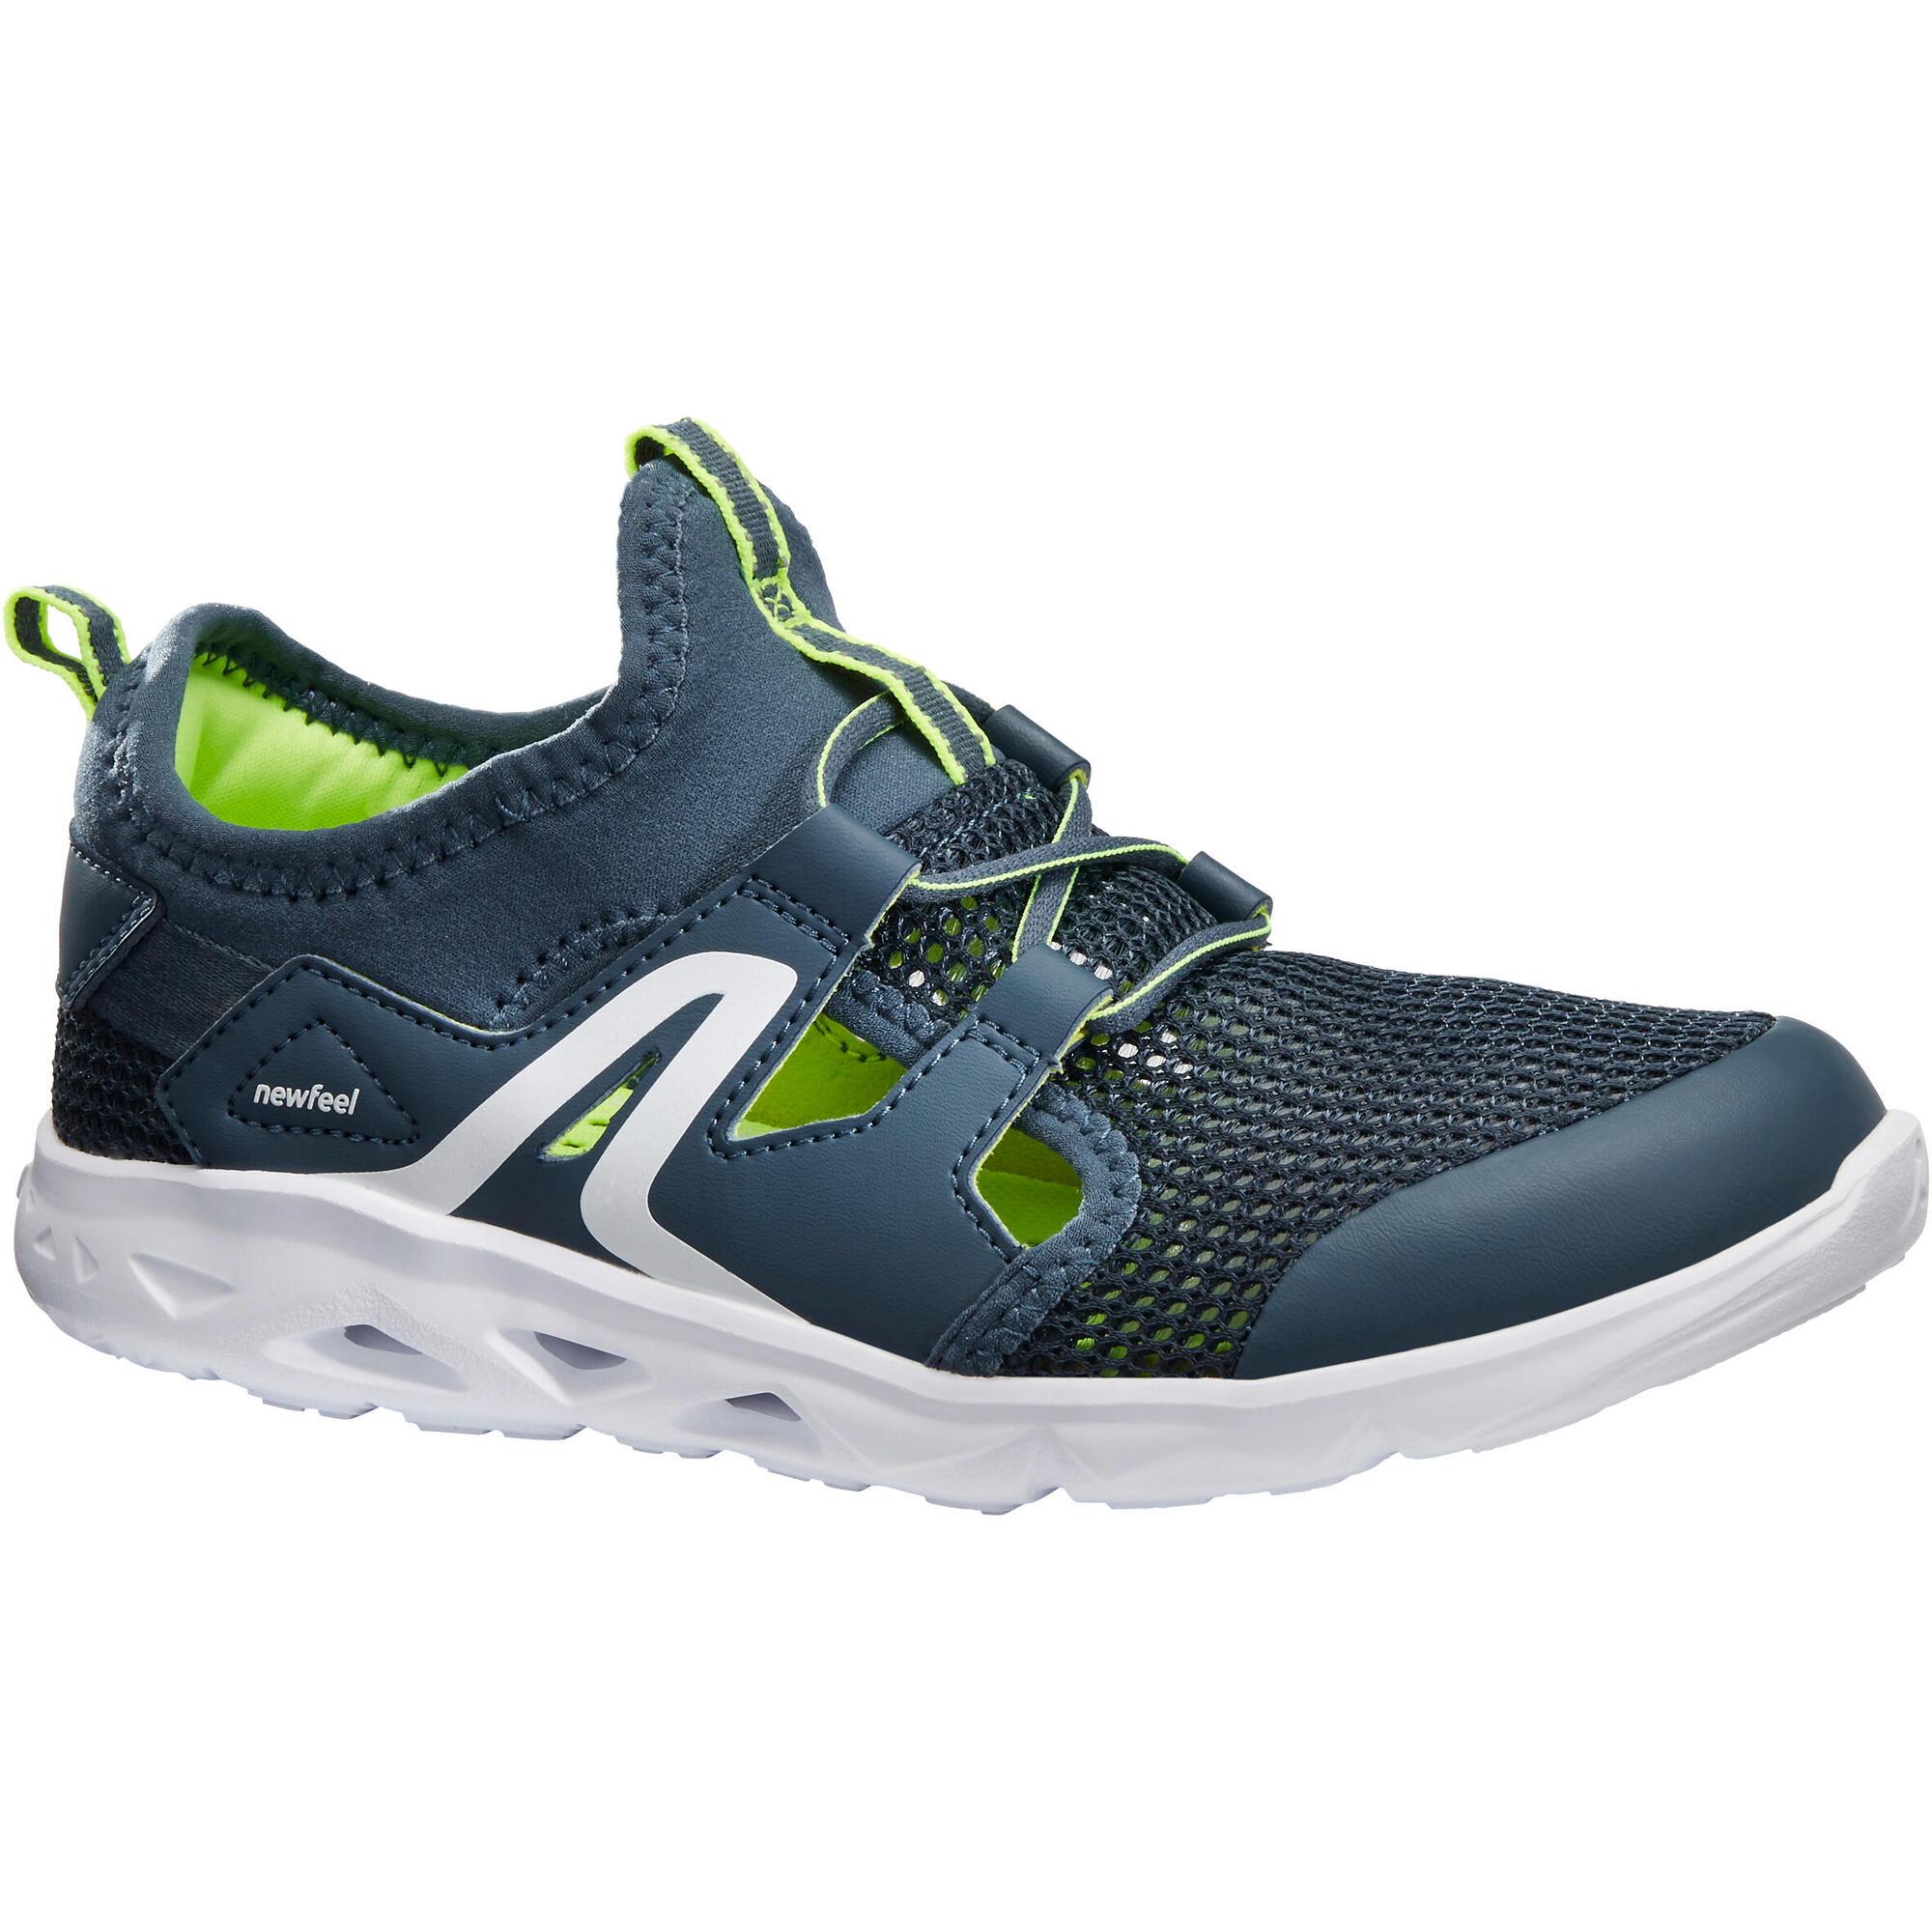 chaussures marche sportive enfant pw 500 fresh gris vert newfeel. Black Bedroom Furniture Sets. Home Design Ideas